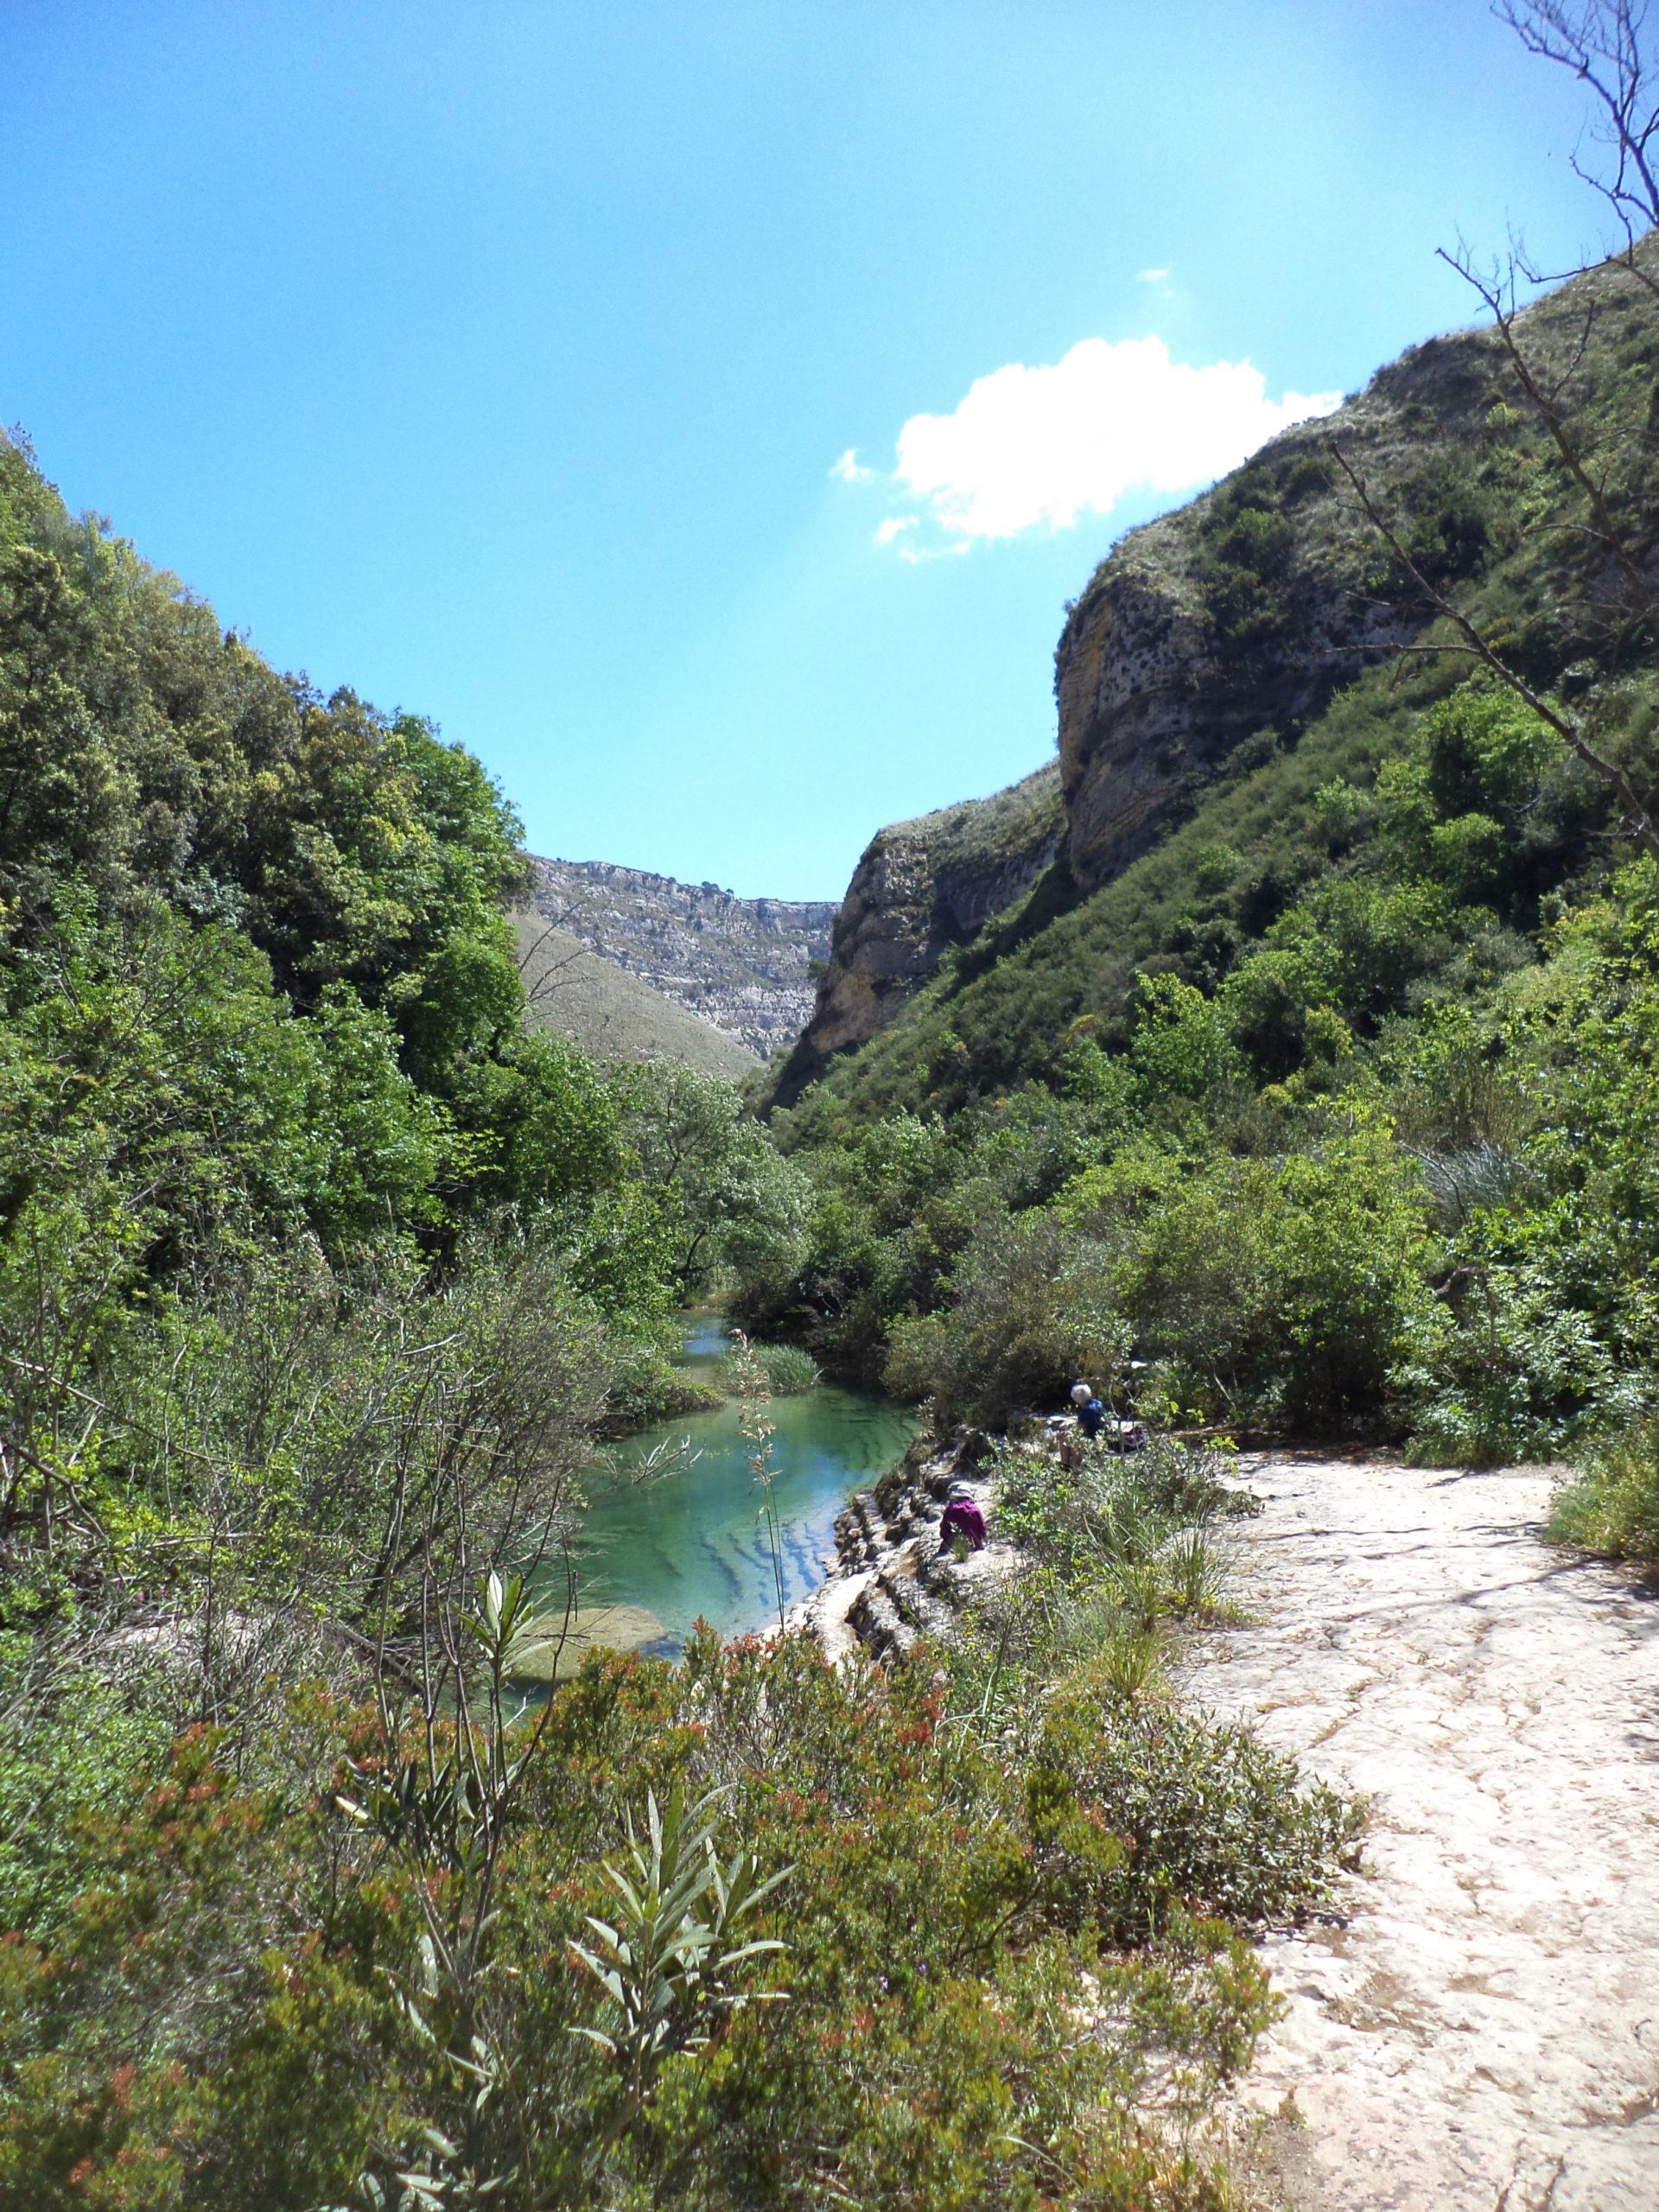 Fiume Cassibile, trekking laghetti di avola, siracusa trekking